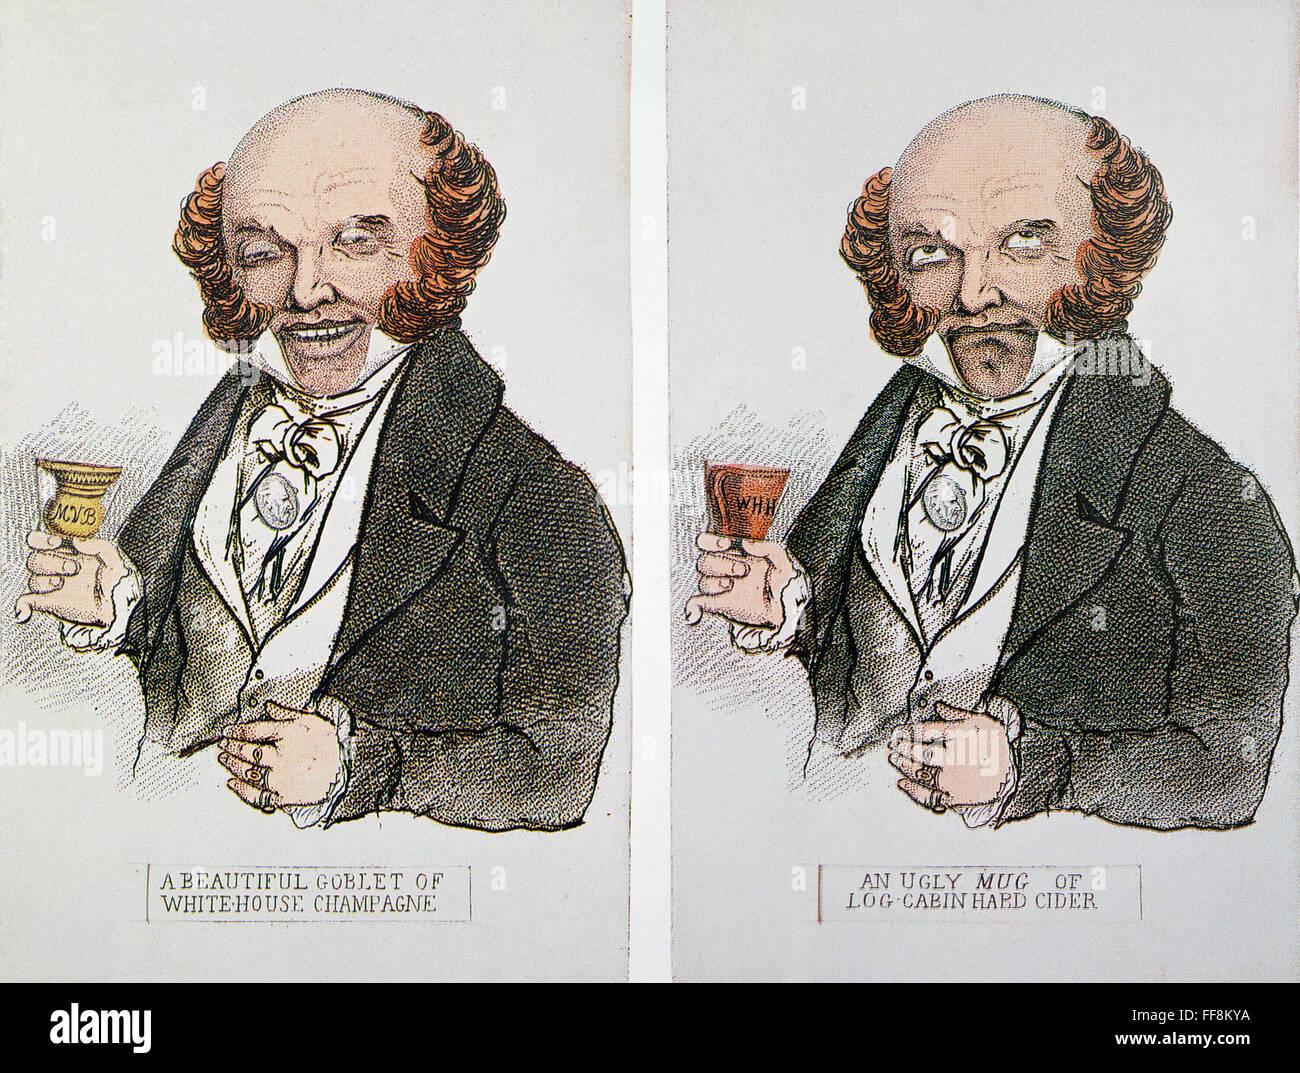 M Van Buren Cartoon 1840 Nwhig Placards Of The 1840